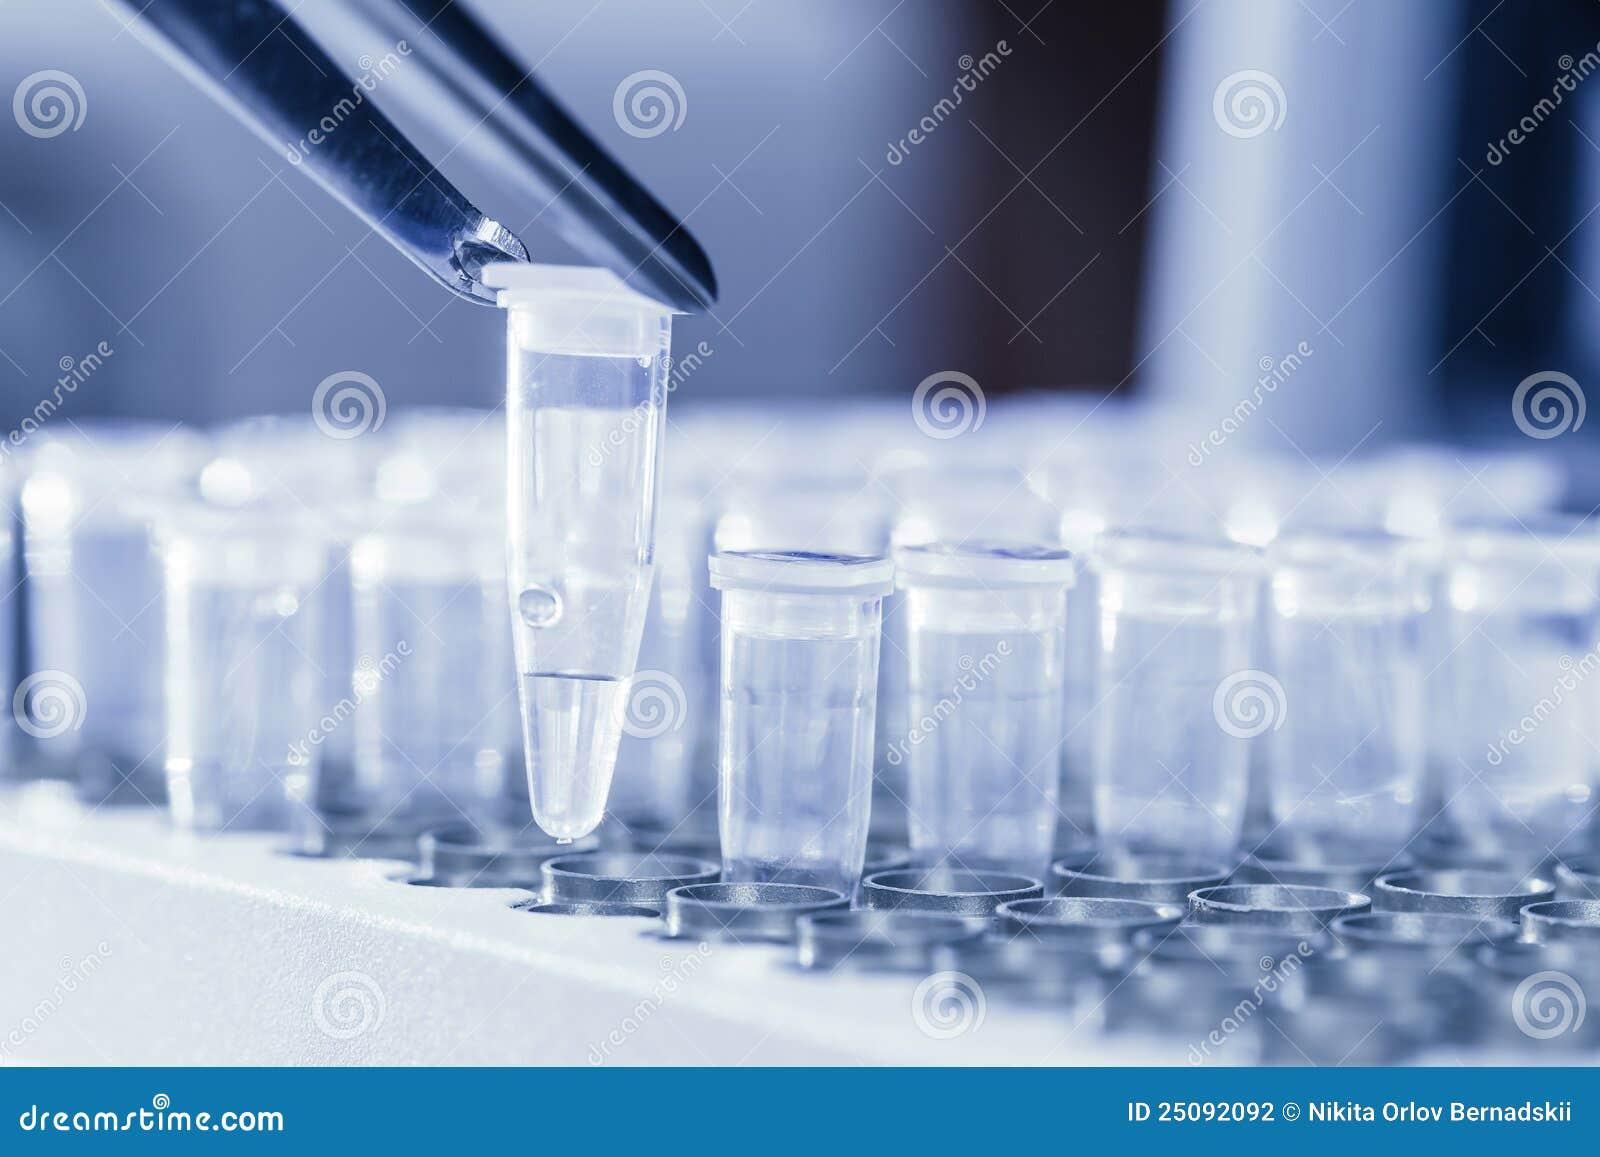 loading dna samples for pcr stock photo